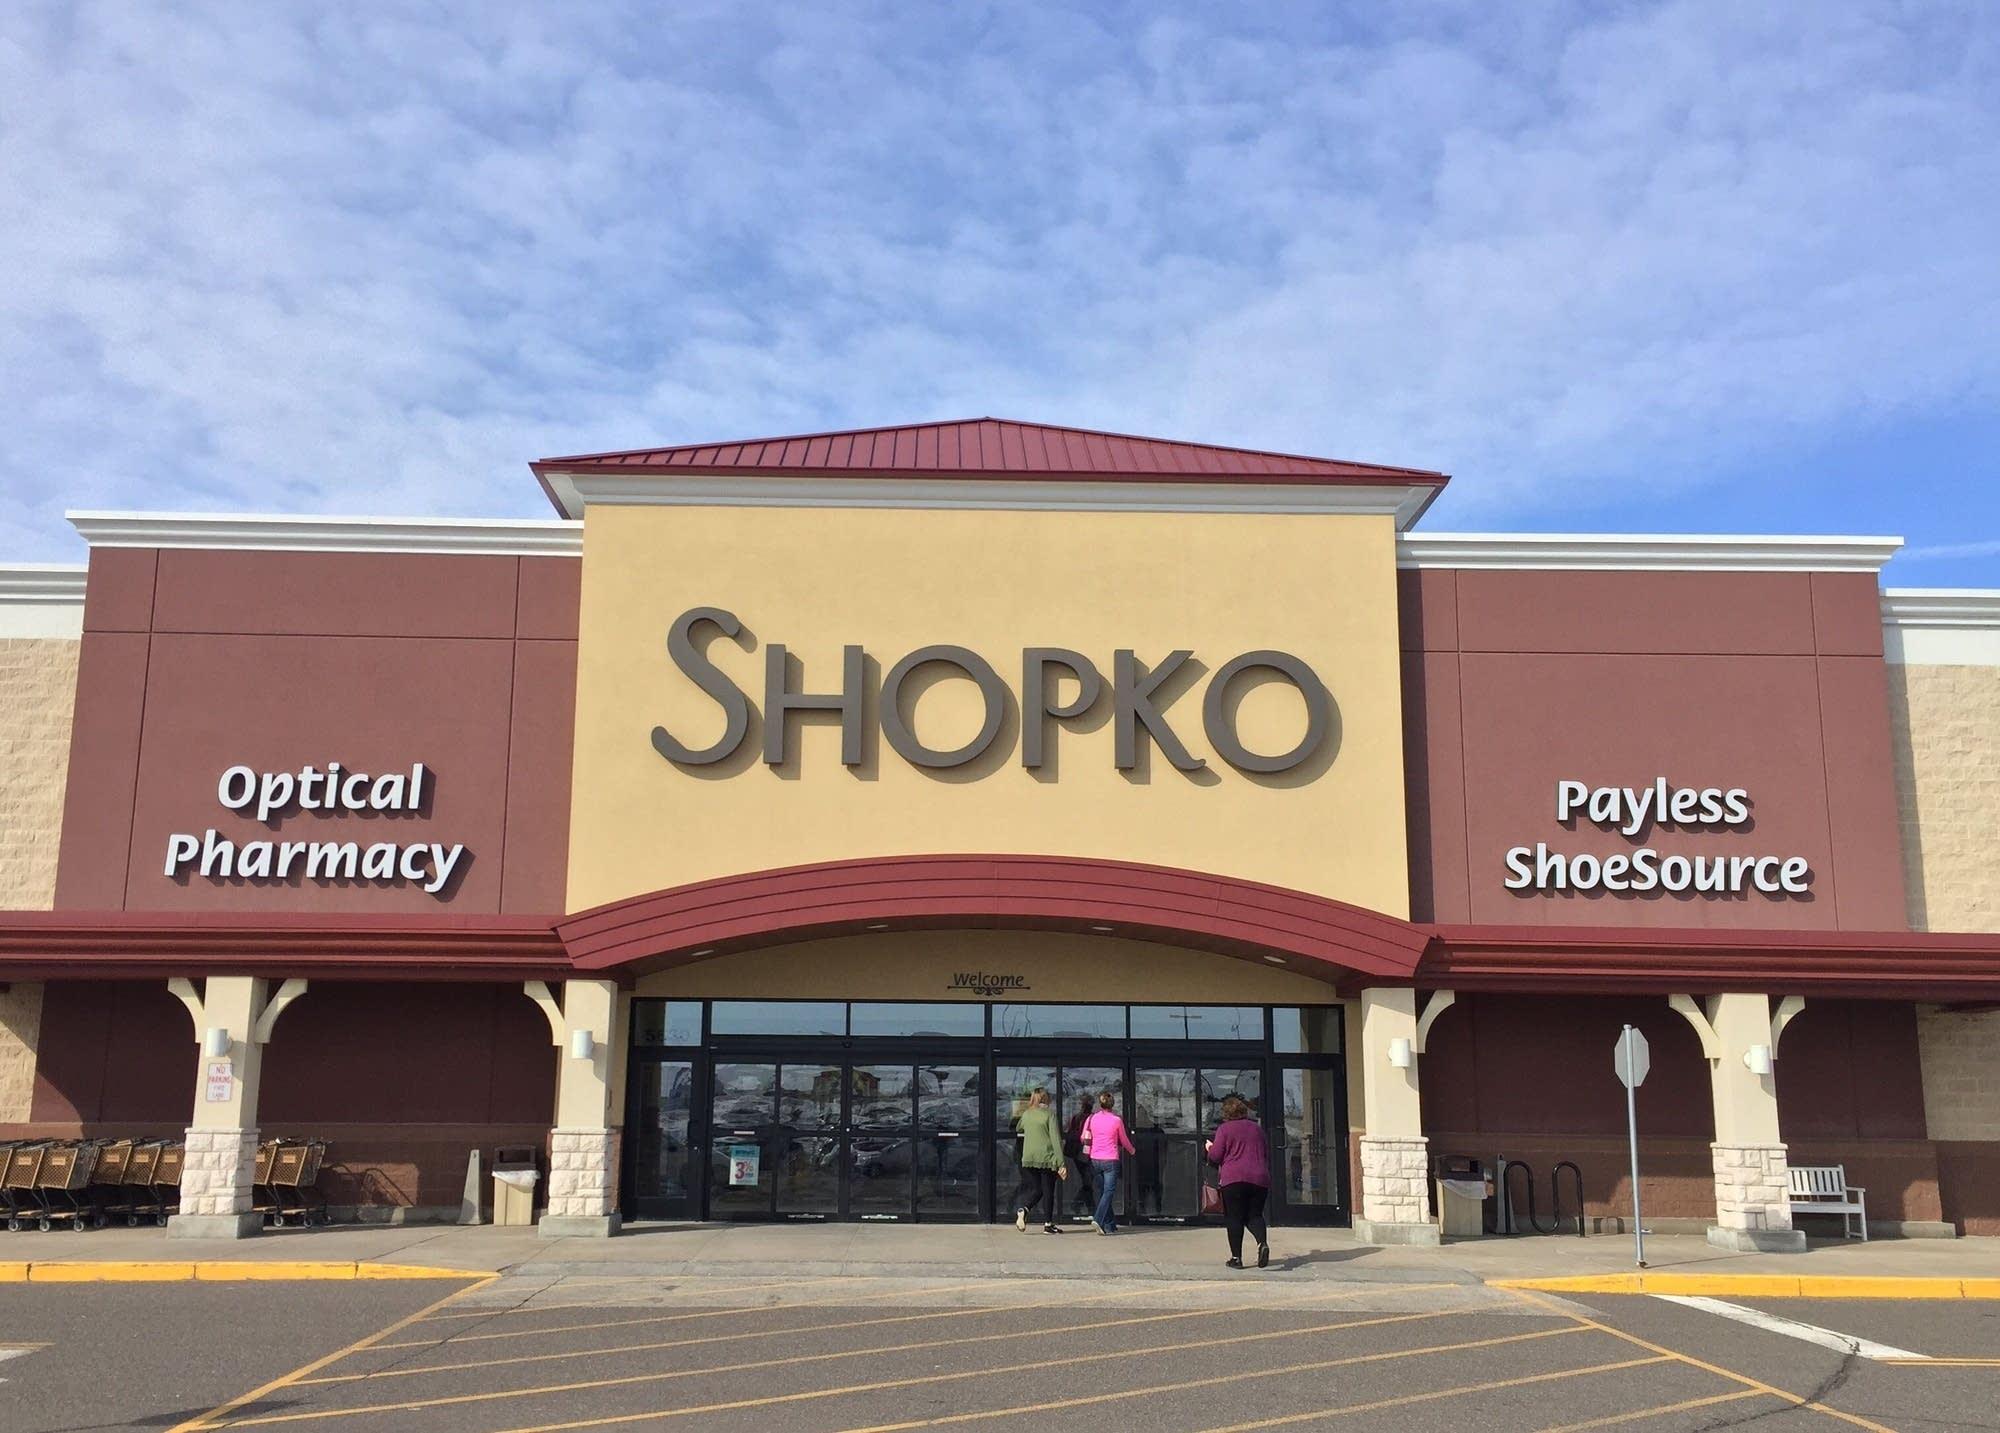 A Shopko retail store in North Branch, Minn.